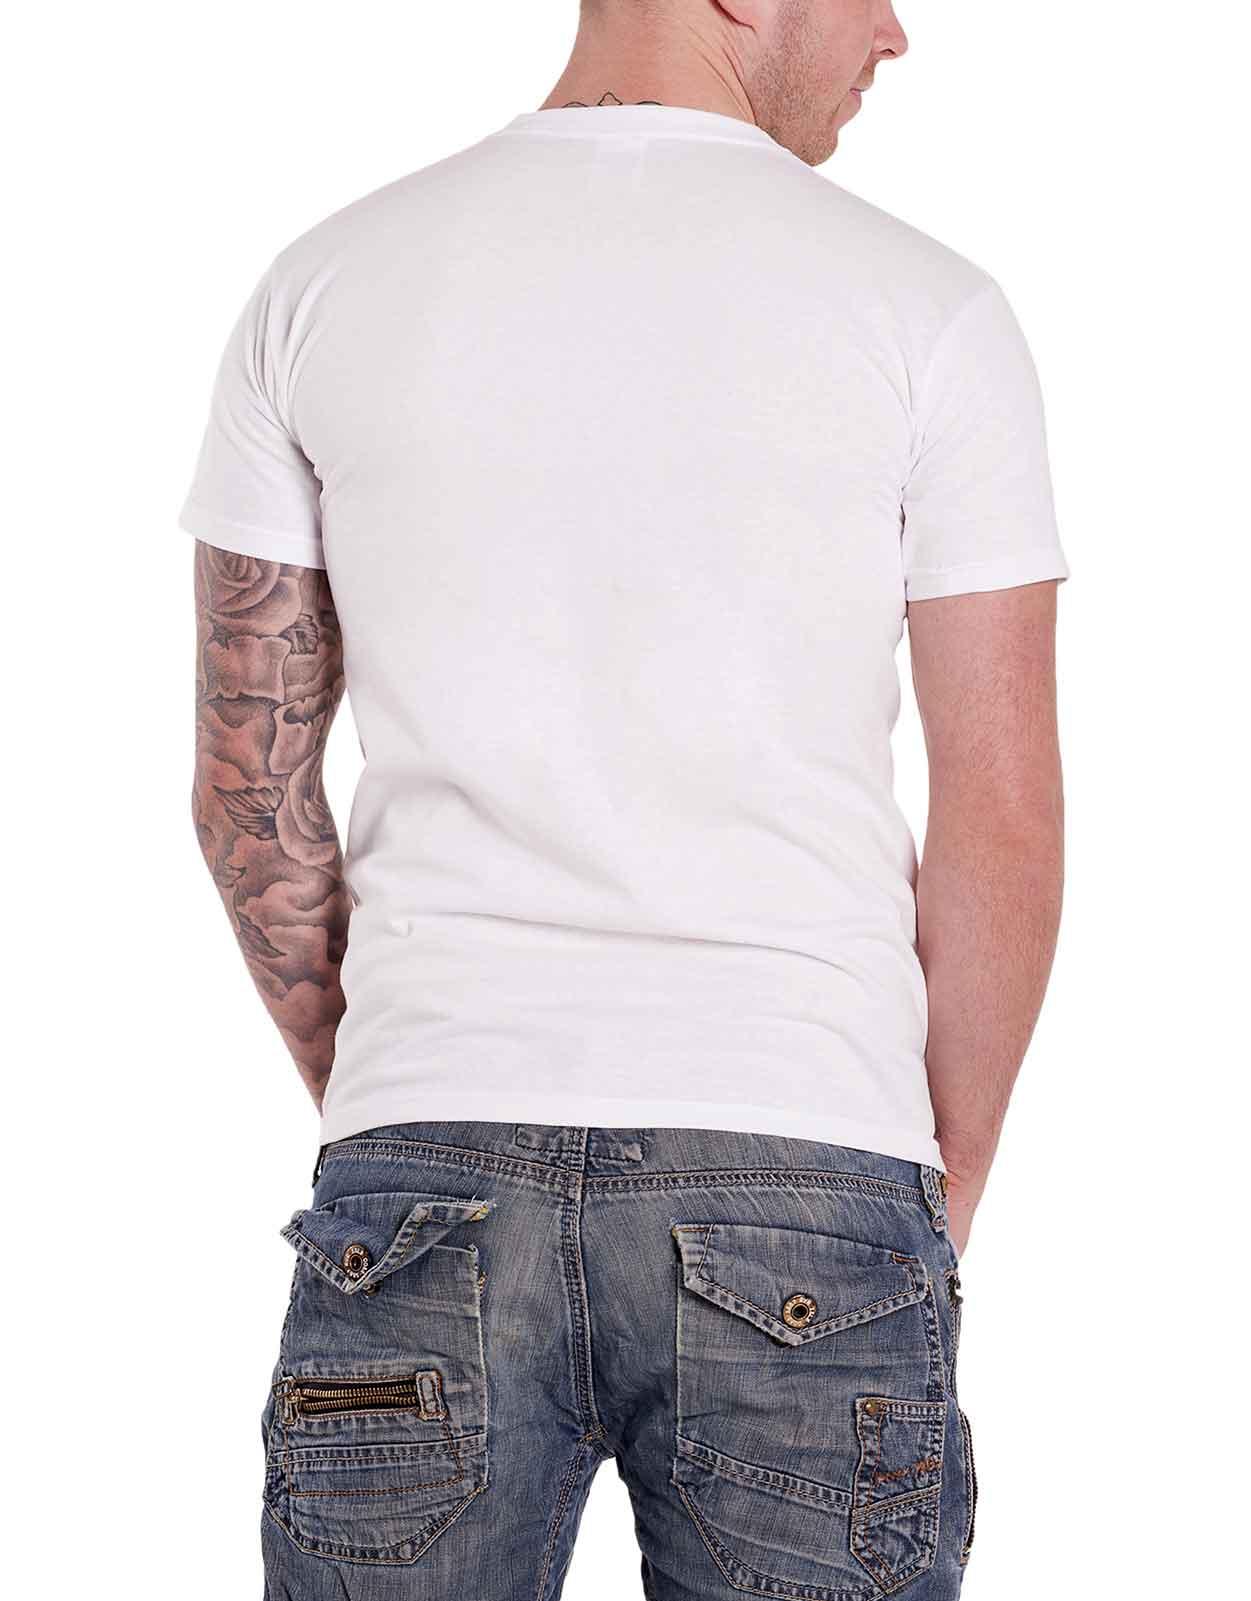 Officiel-The-Doors-T-Shirt-Jim-Morrison-poete-americain-Break-On-Through-Homme-NEUF miniature 55